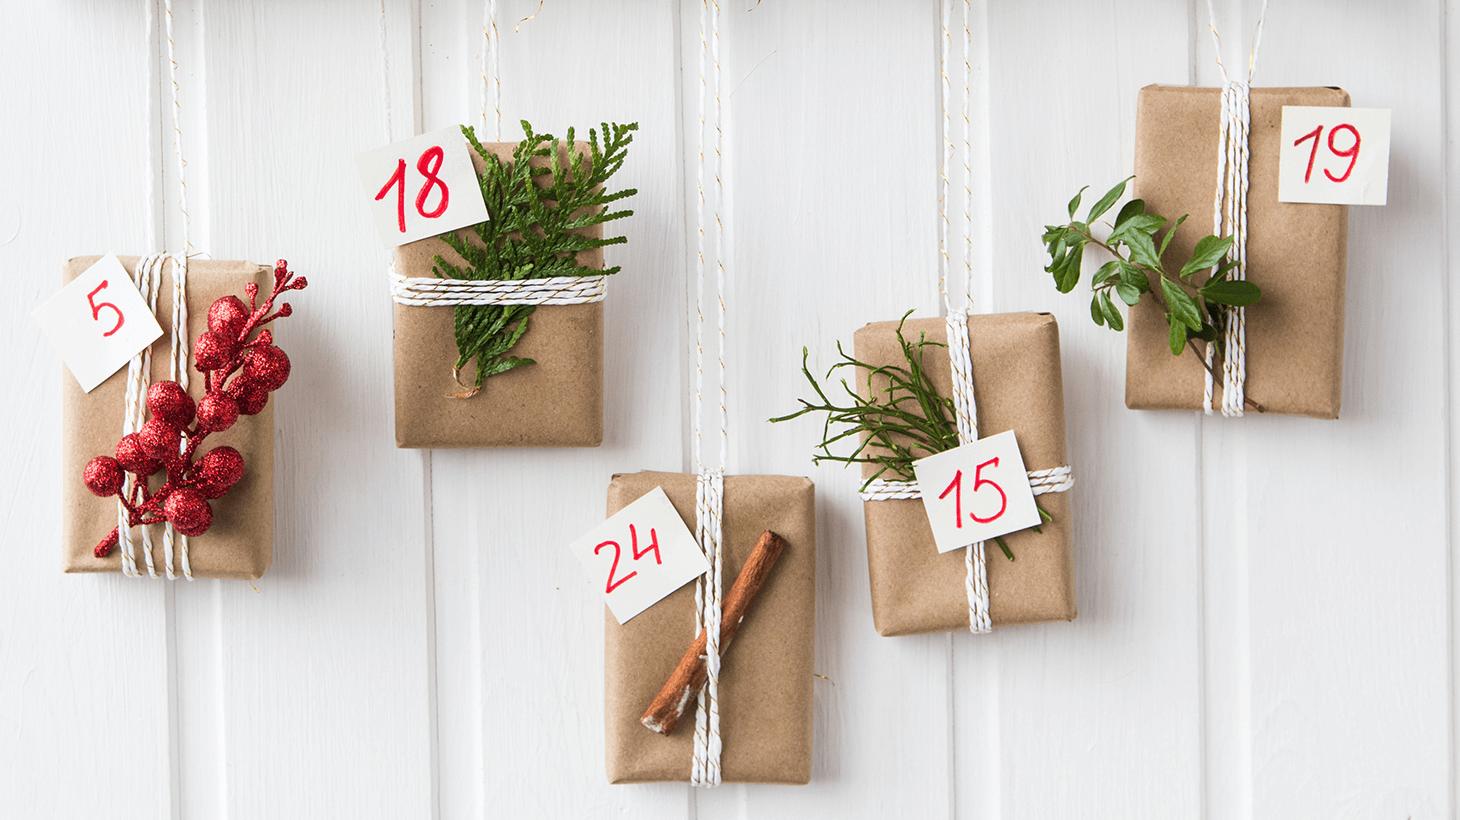 Adventskalender selber befüllen - 10 kreative Ideen für das Weihnachts-Highlight